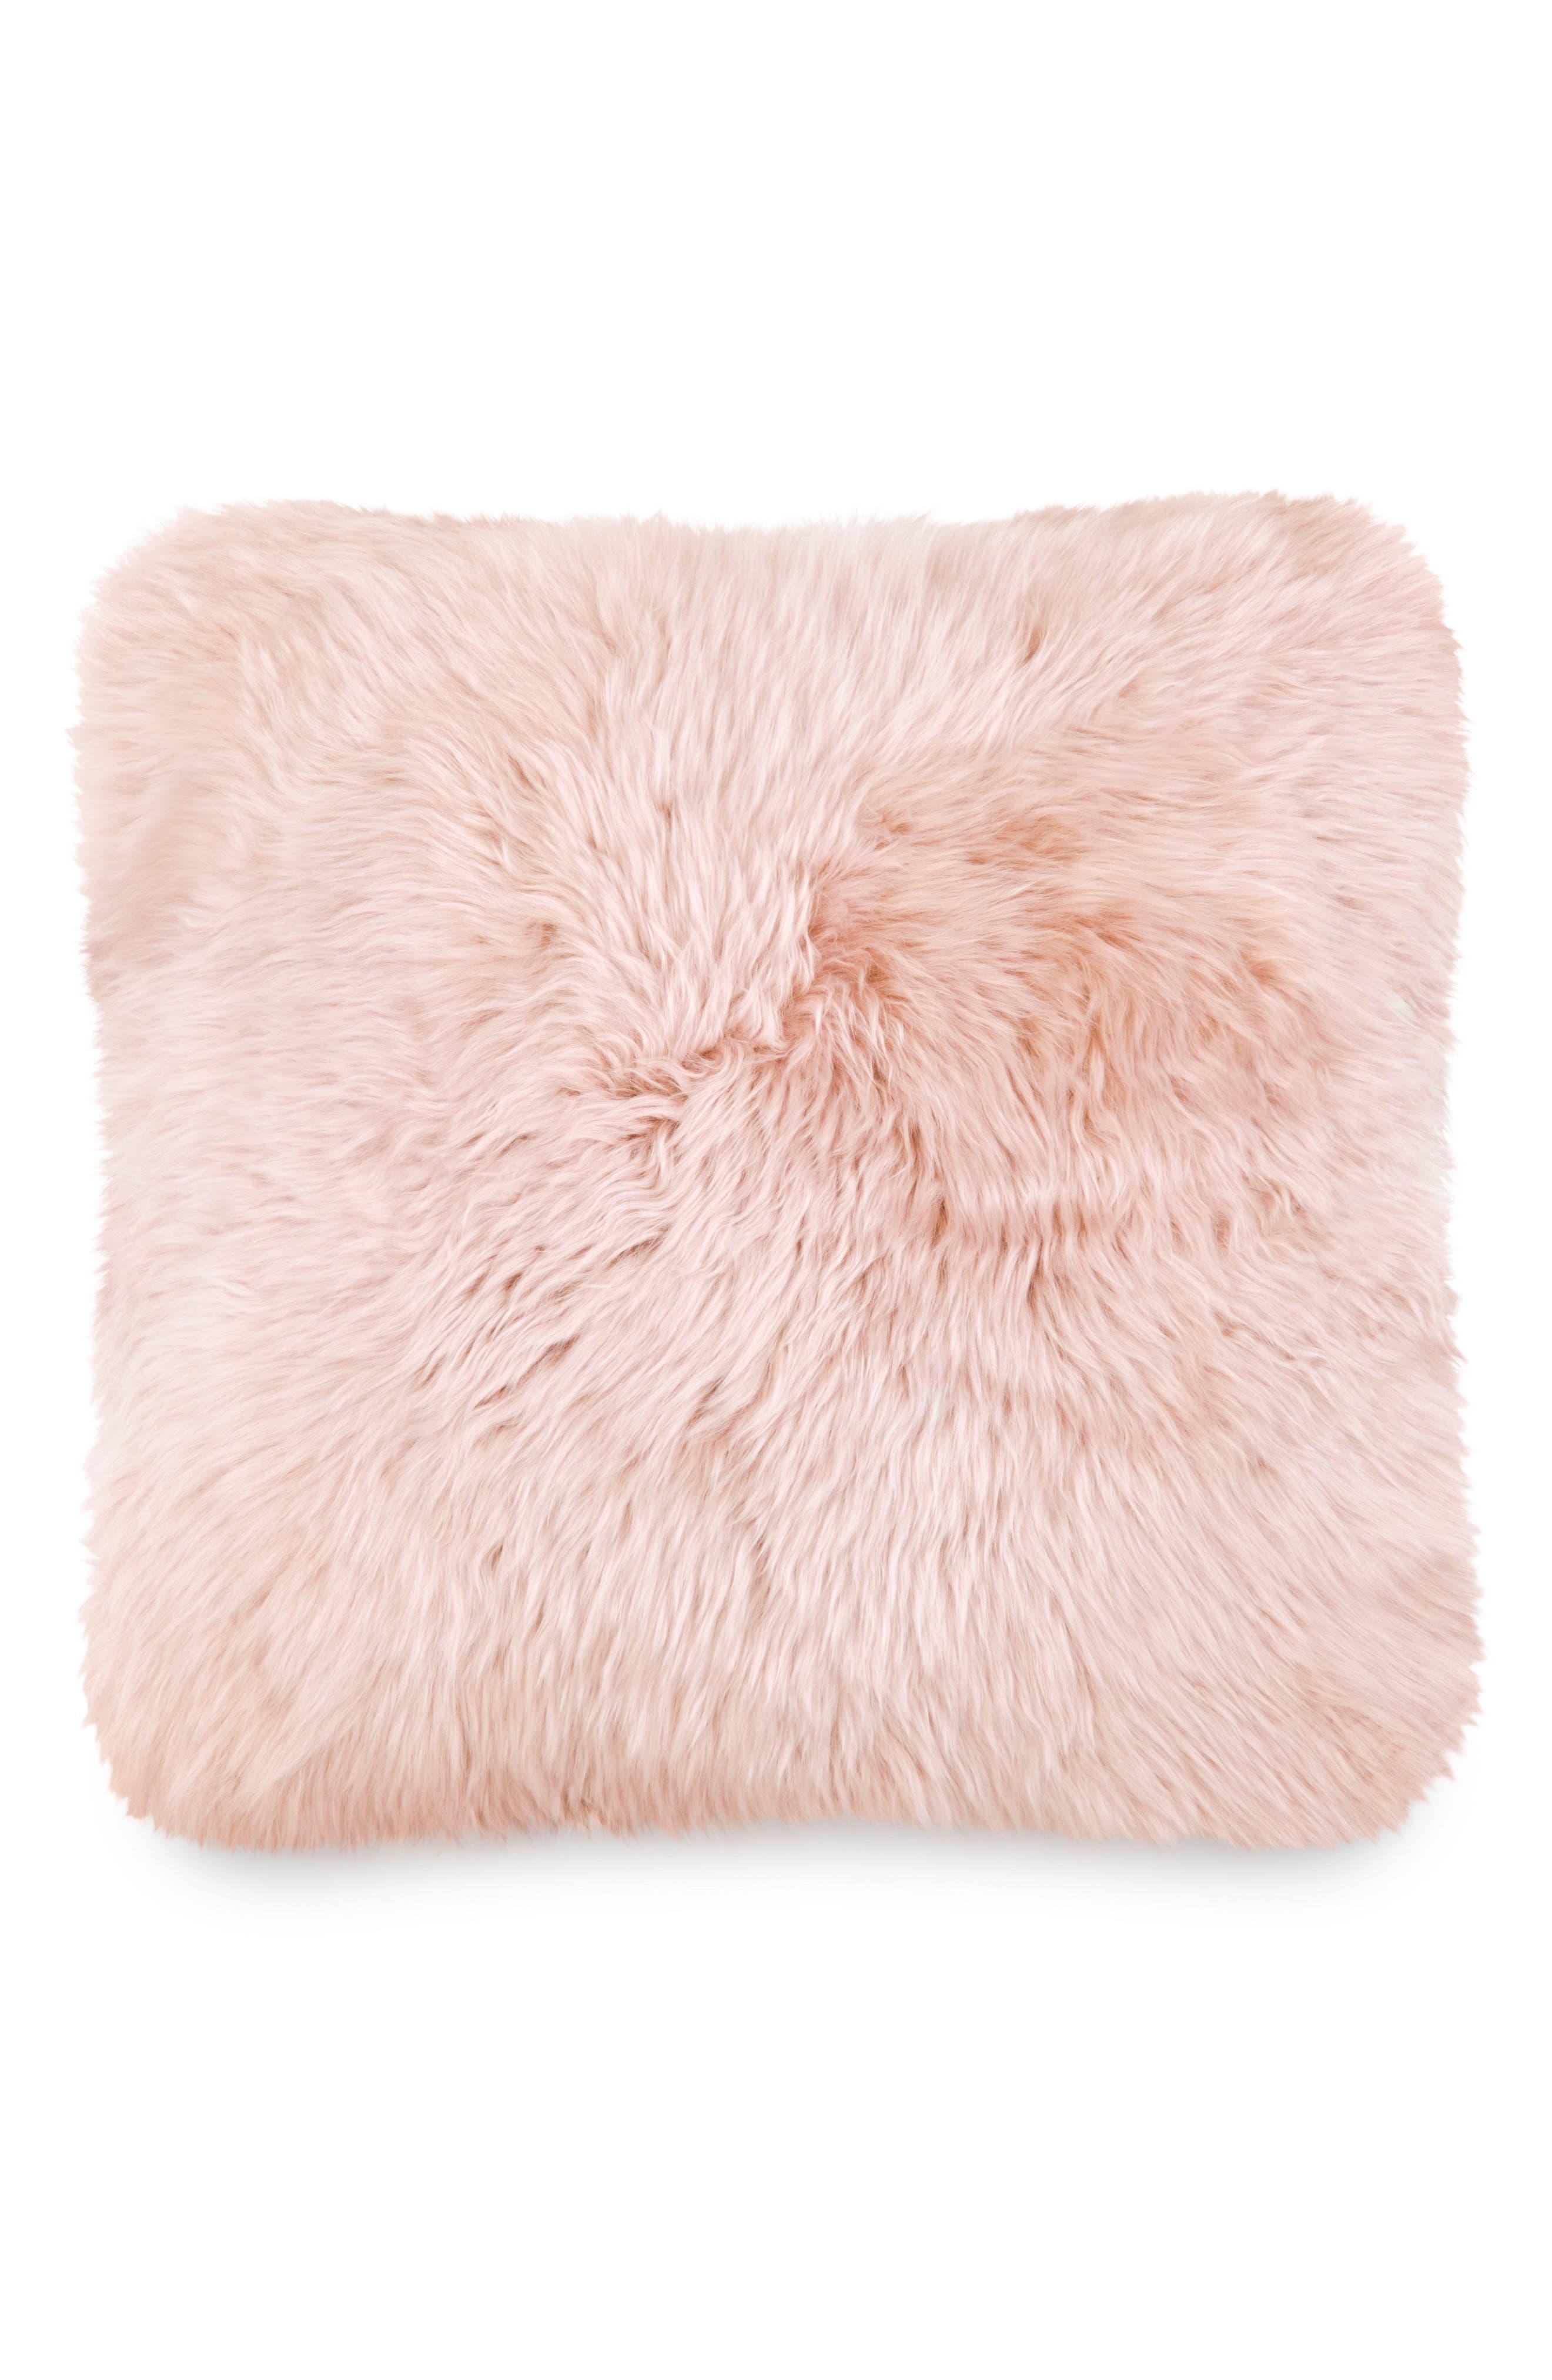 Genuine Sheepskin Accent Pillow,                             Main thumbnail 1, color,                             Blush